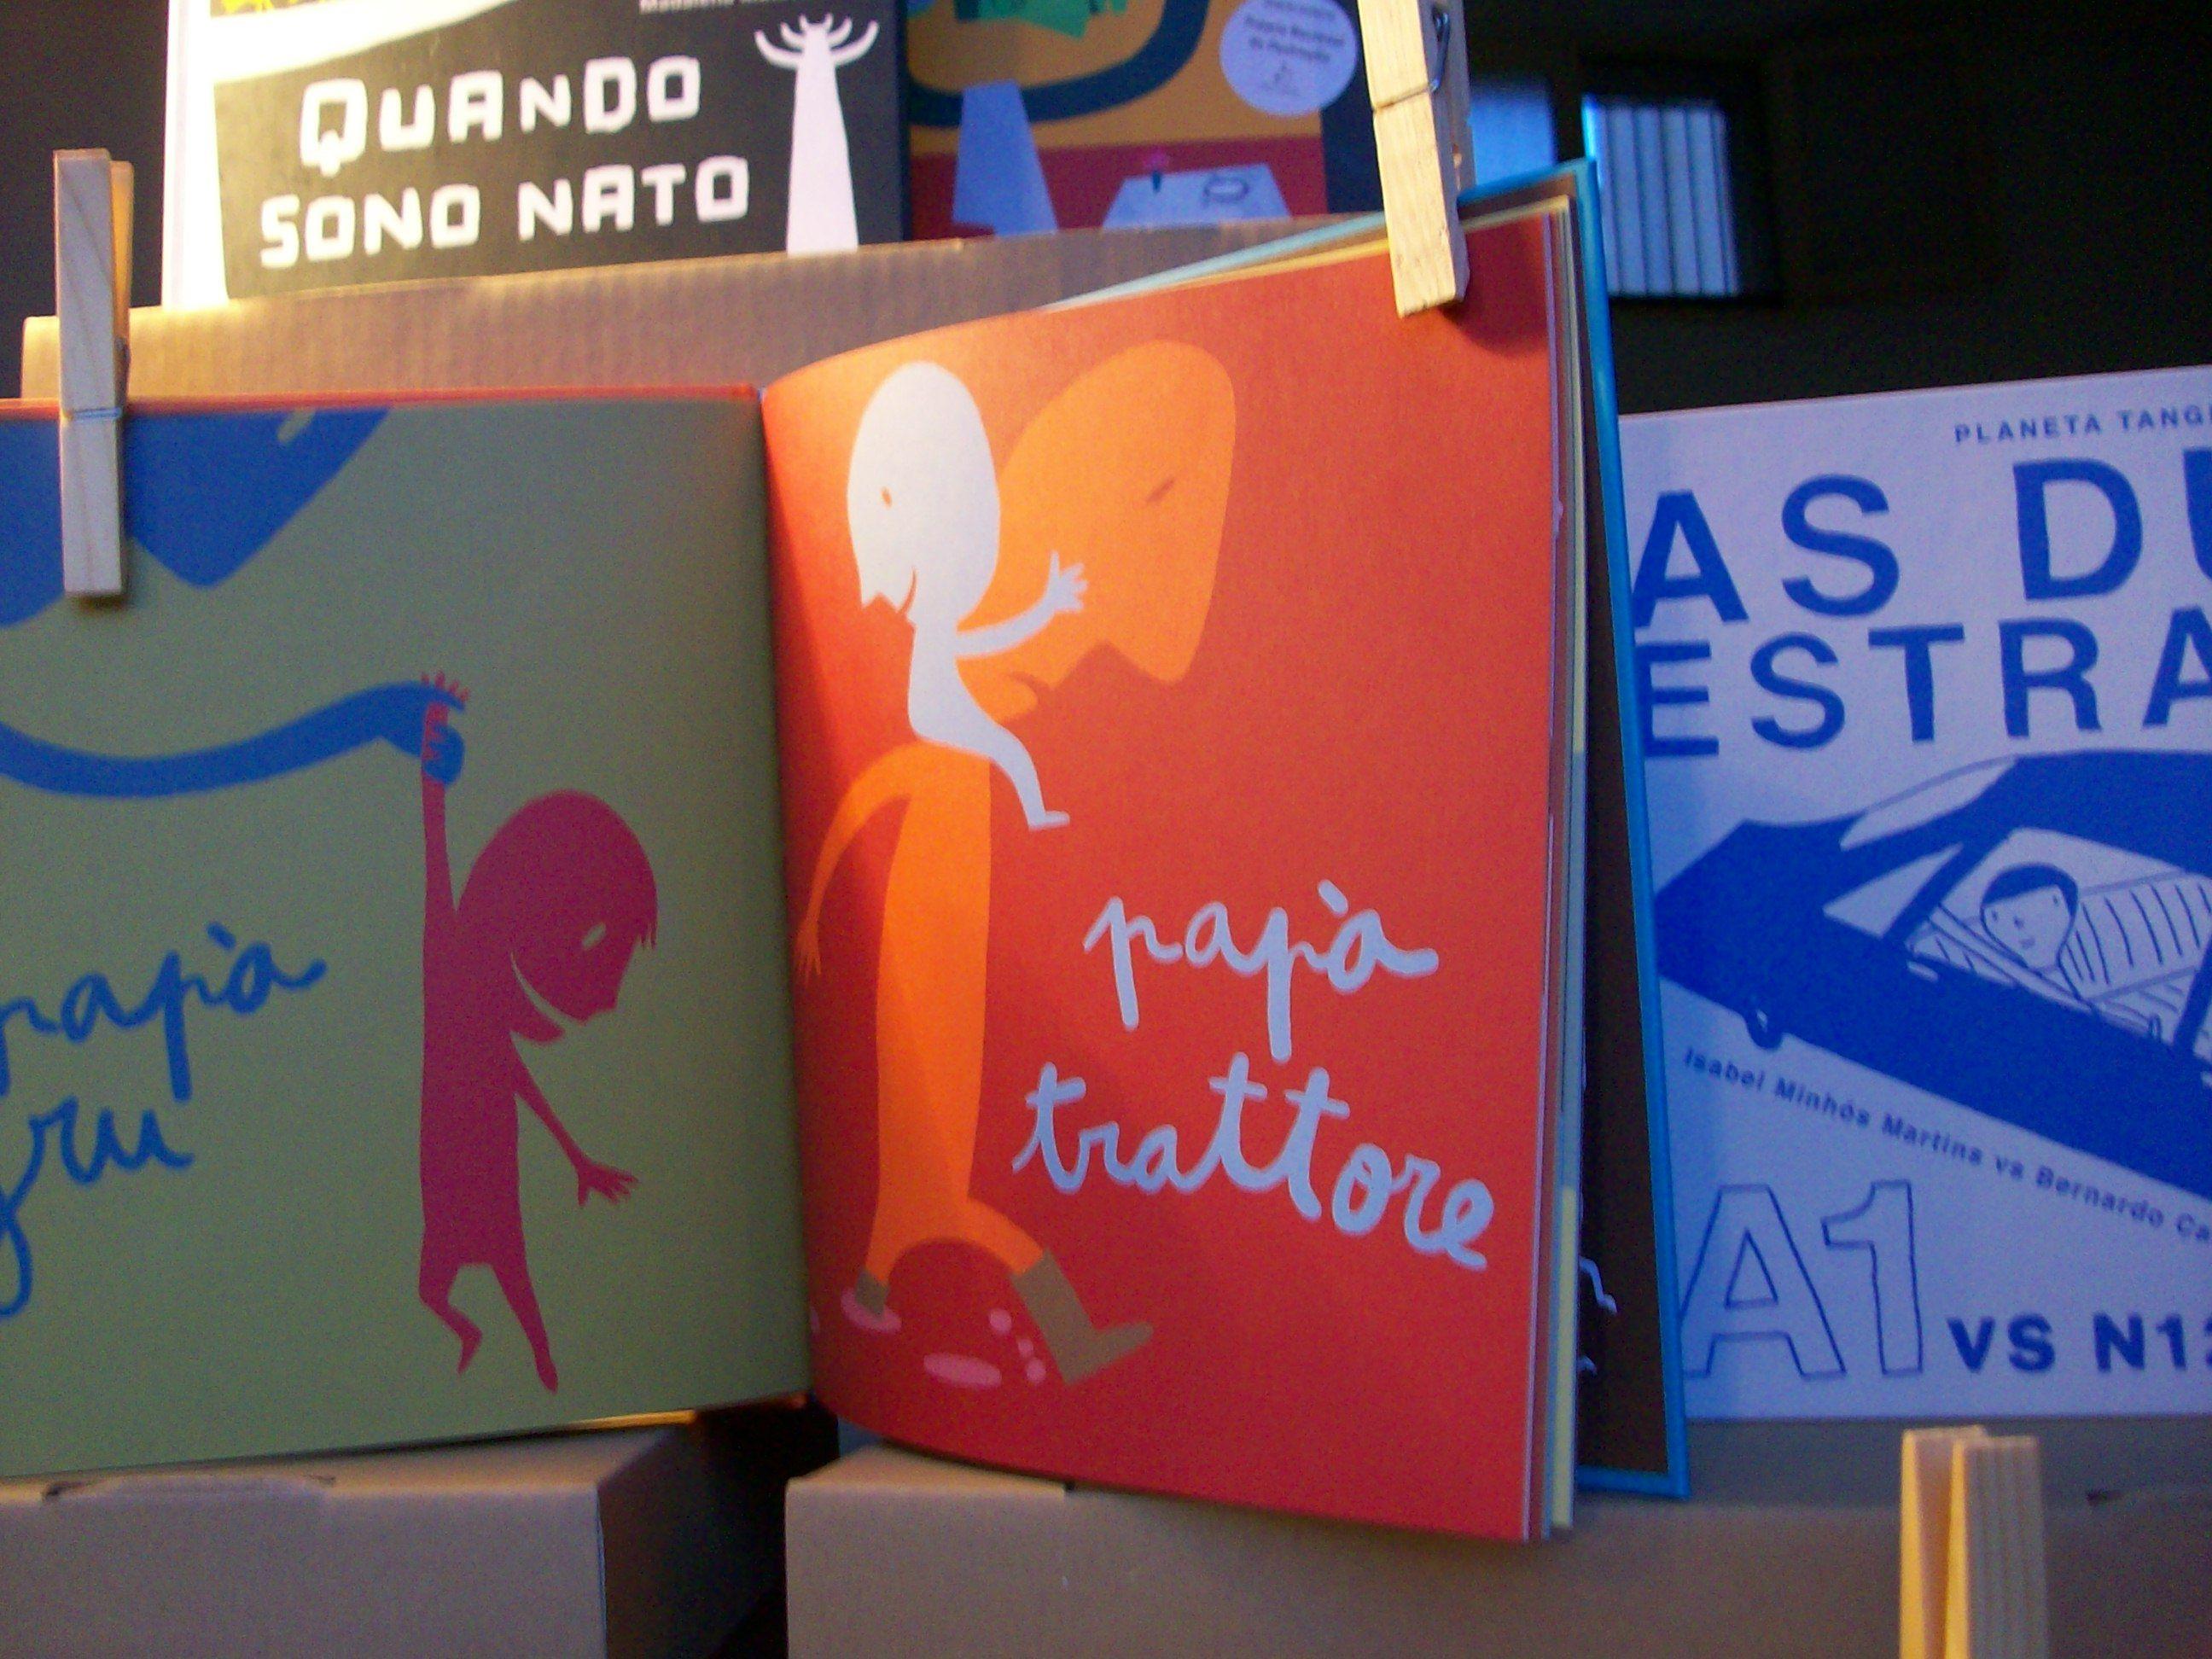 Libri irresistibili  P di papà, Isabel Minhós Martins e Bernardo Carvalho, Topipittori